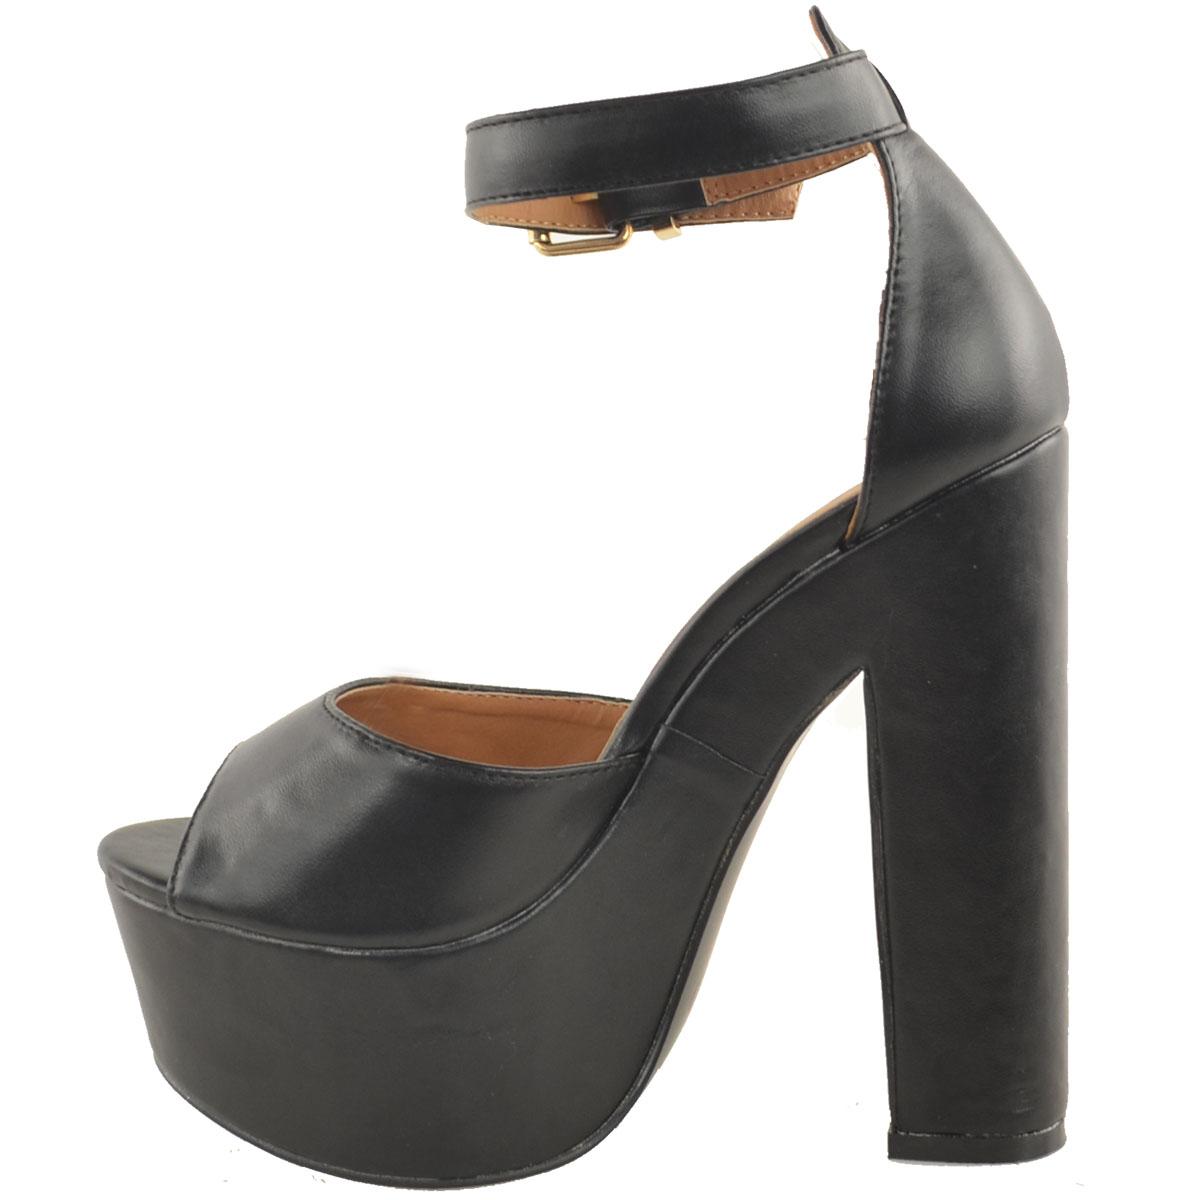 neu damen kn chel riemen plateau kolbig high heels. Black Bedroom Furniture Sets. Home Design Ideas